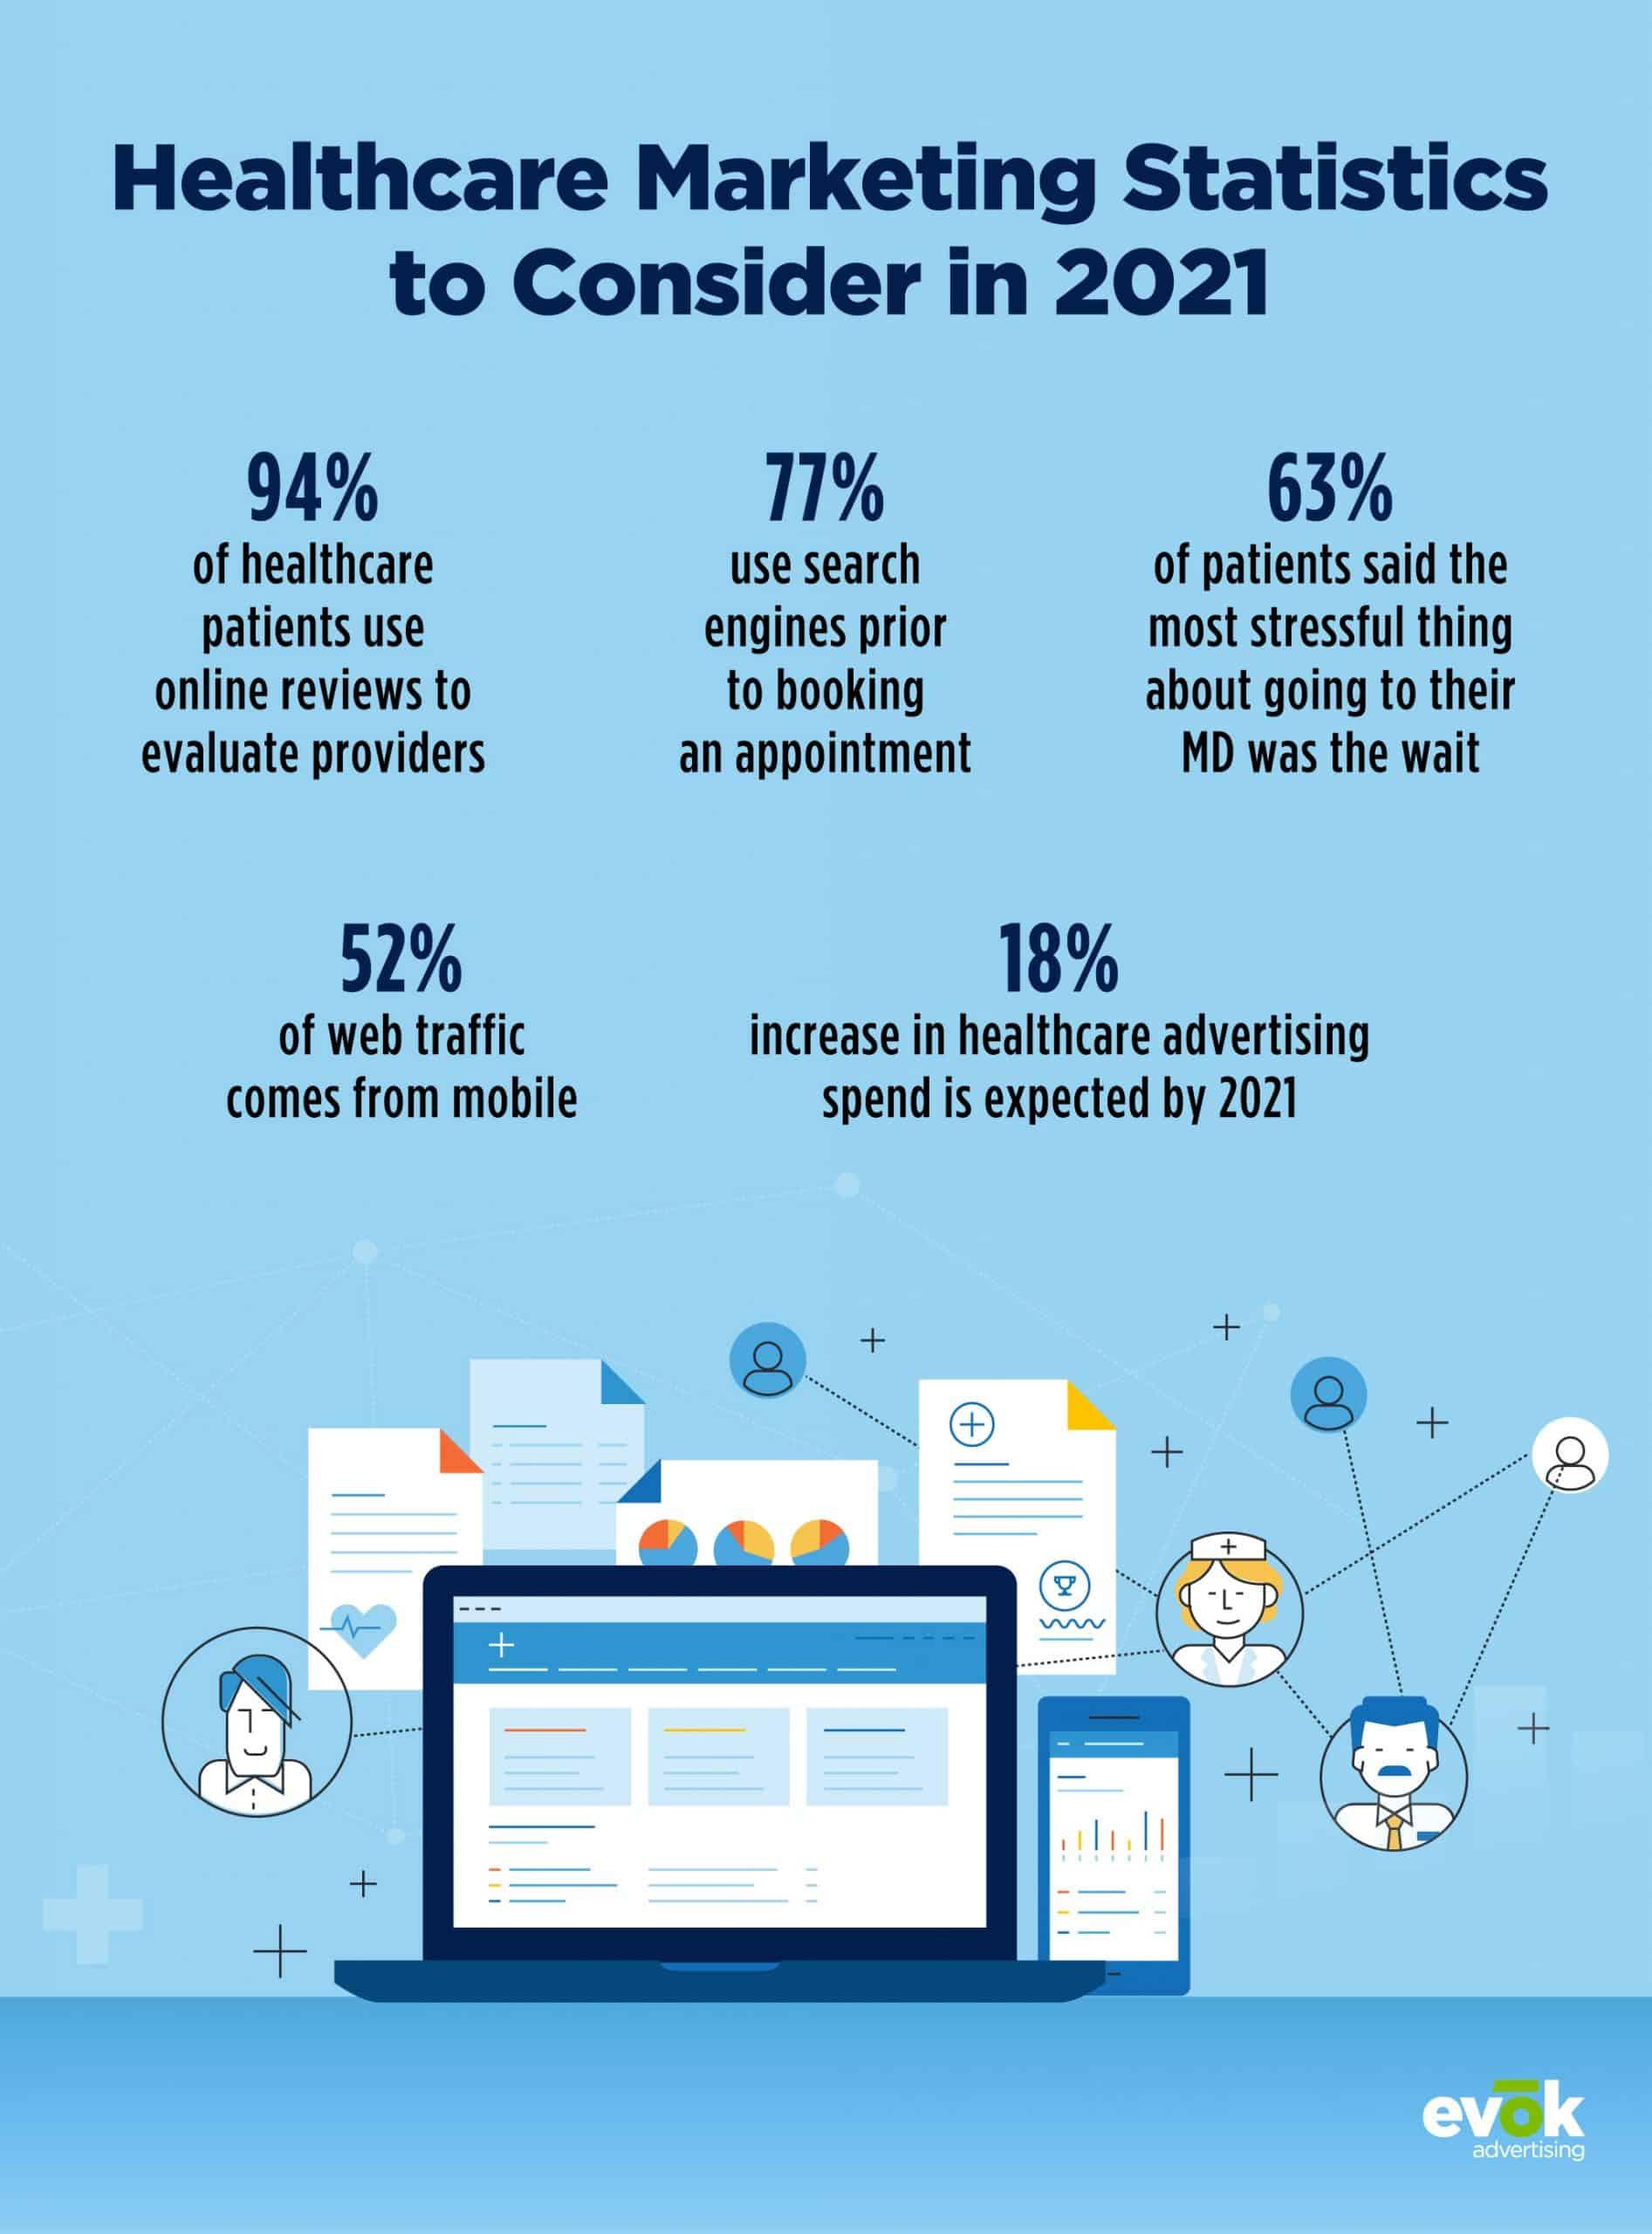 Healthcare Marketing Statistics in 2021